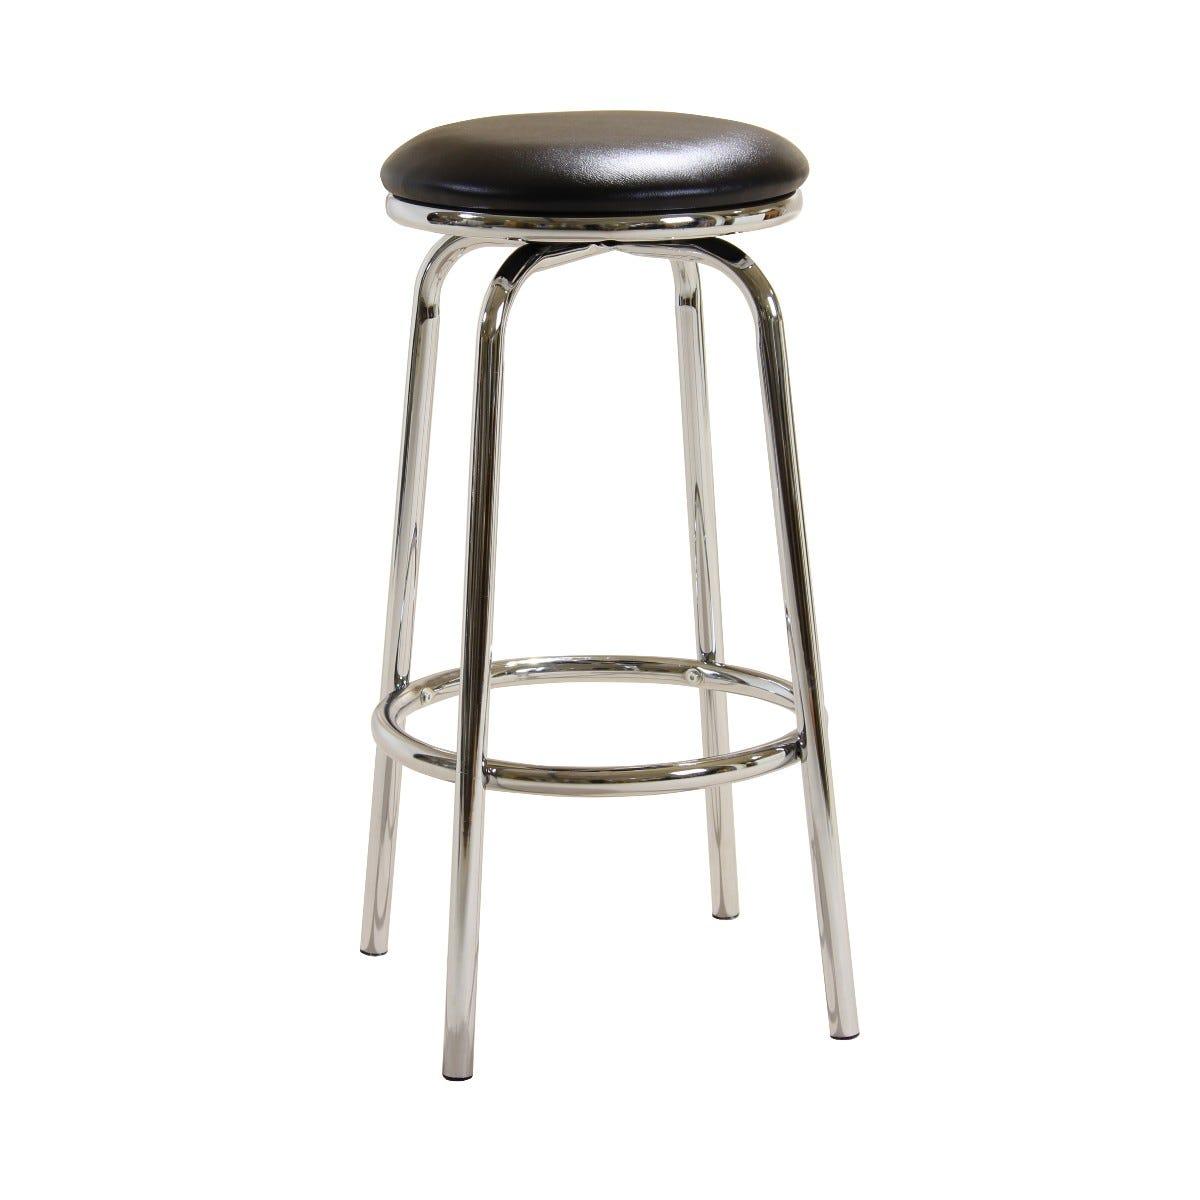 76cm Chrome Bar Stool with Swivel Seat